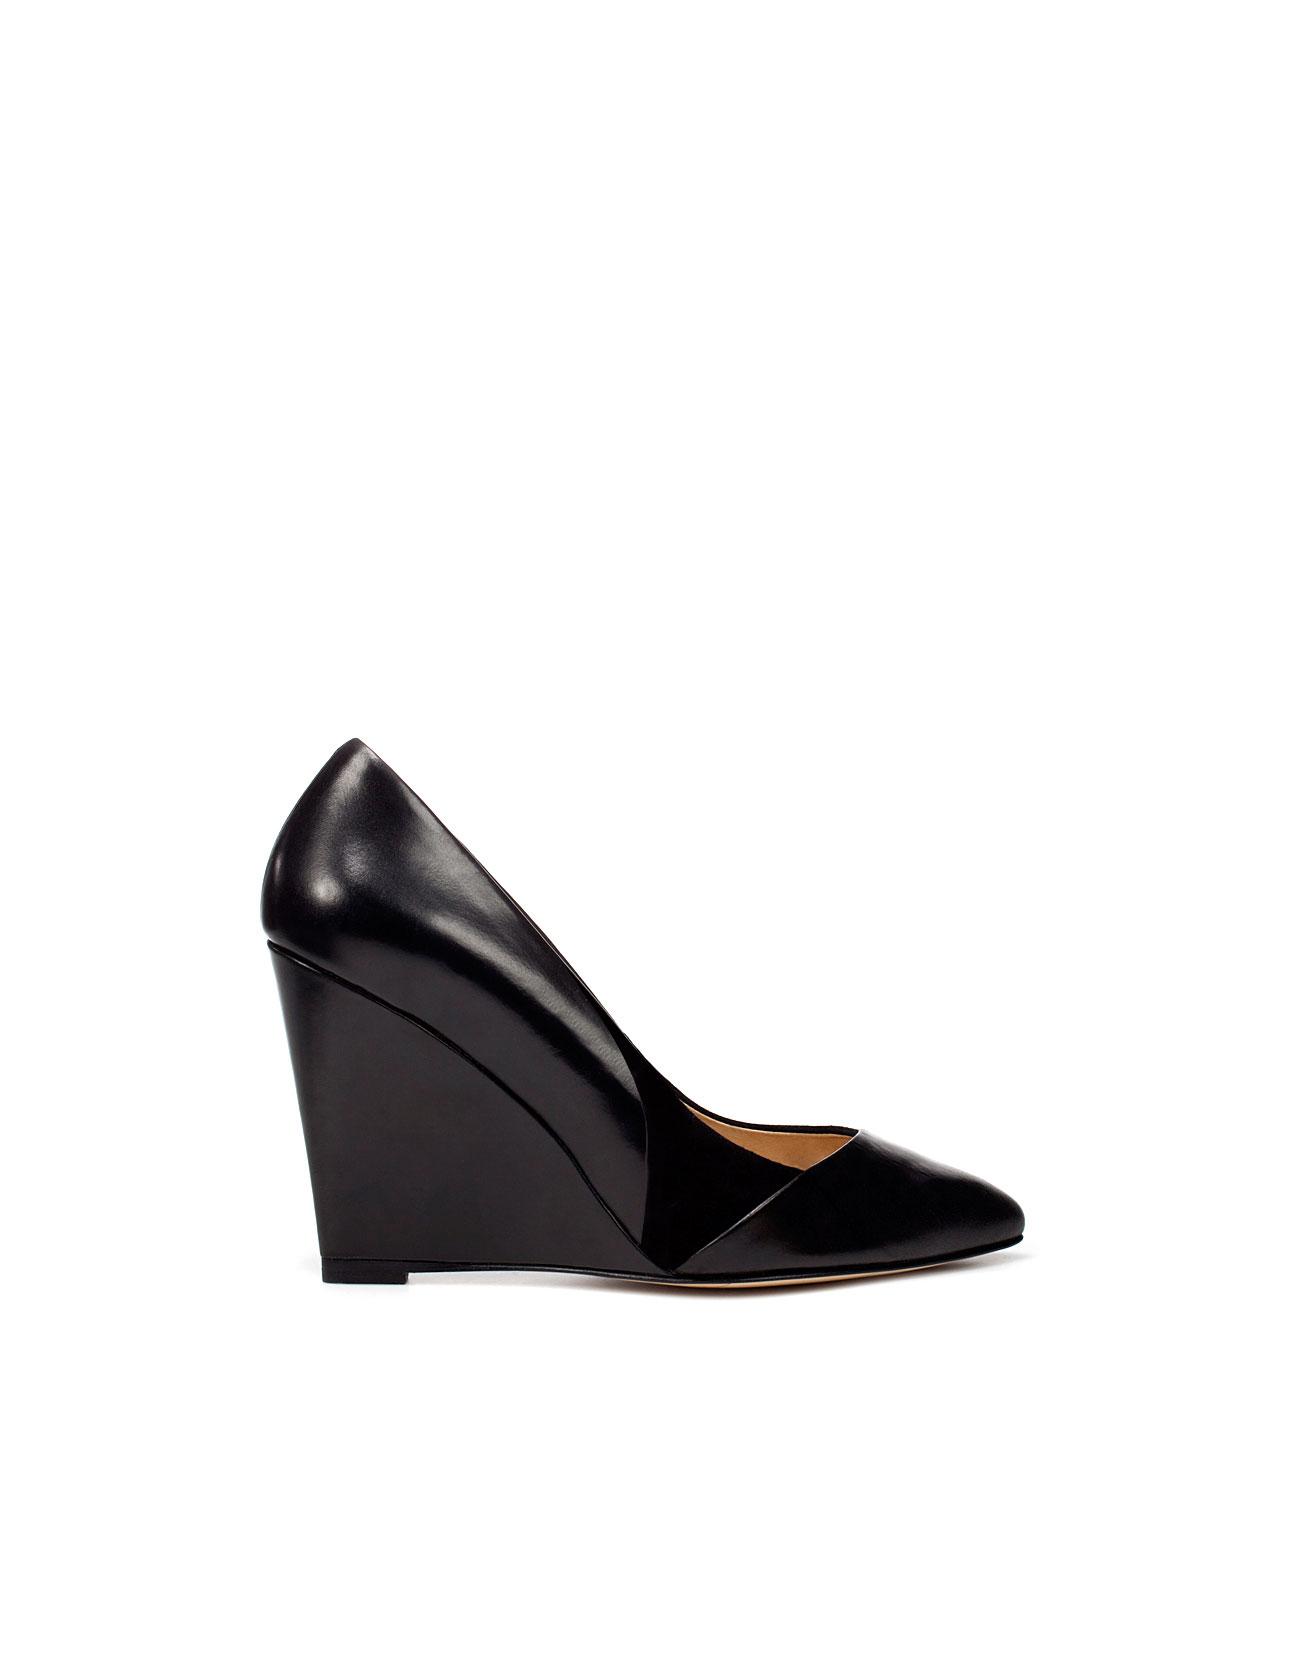 zara pointed wedge court shoe in black lyst